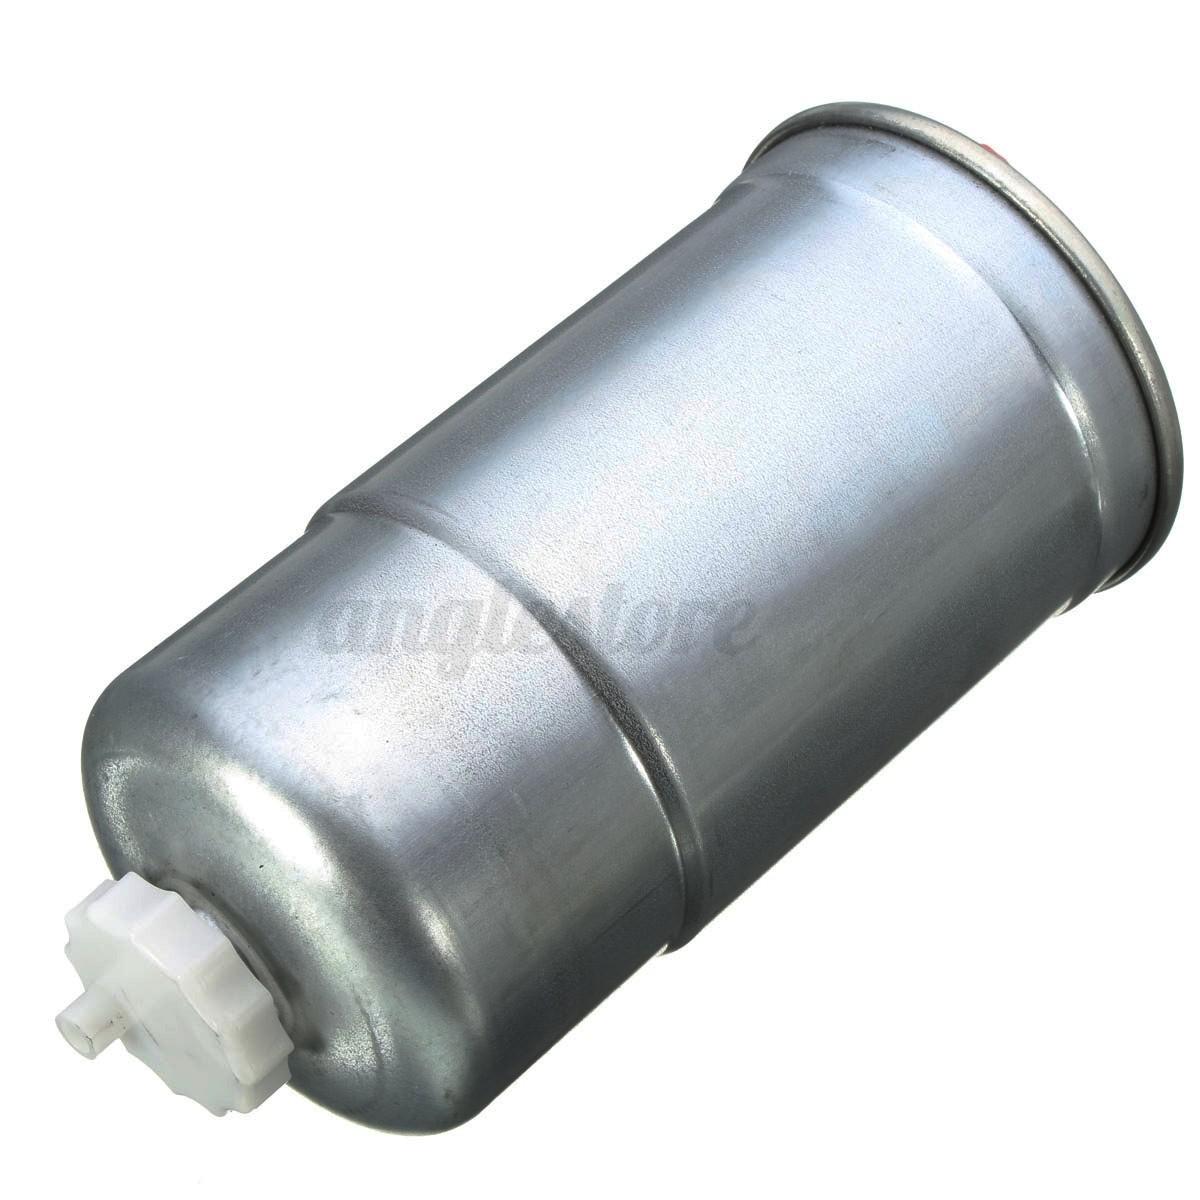 hight resolution of details about fuel filter for vw beetle golf jetta passat alh bew bhw tdi 1 9 2 0l kl147d us